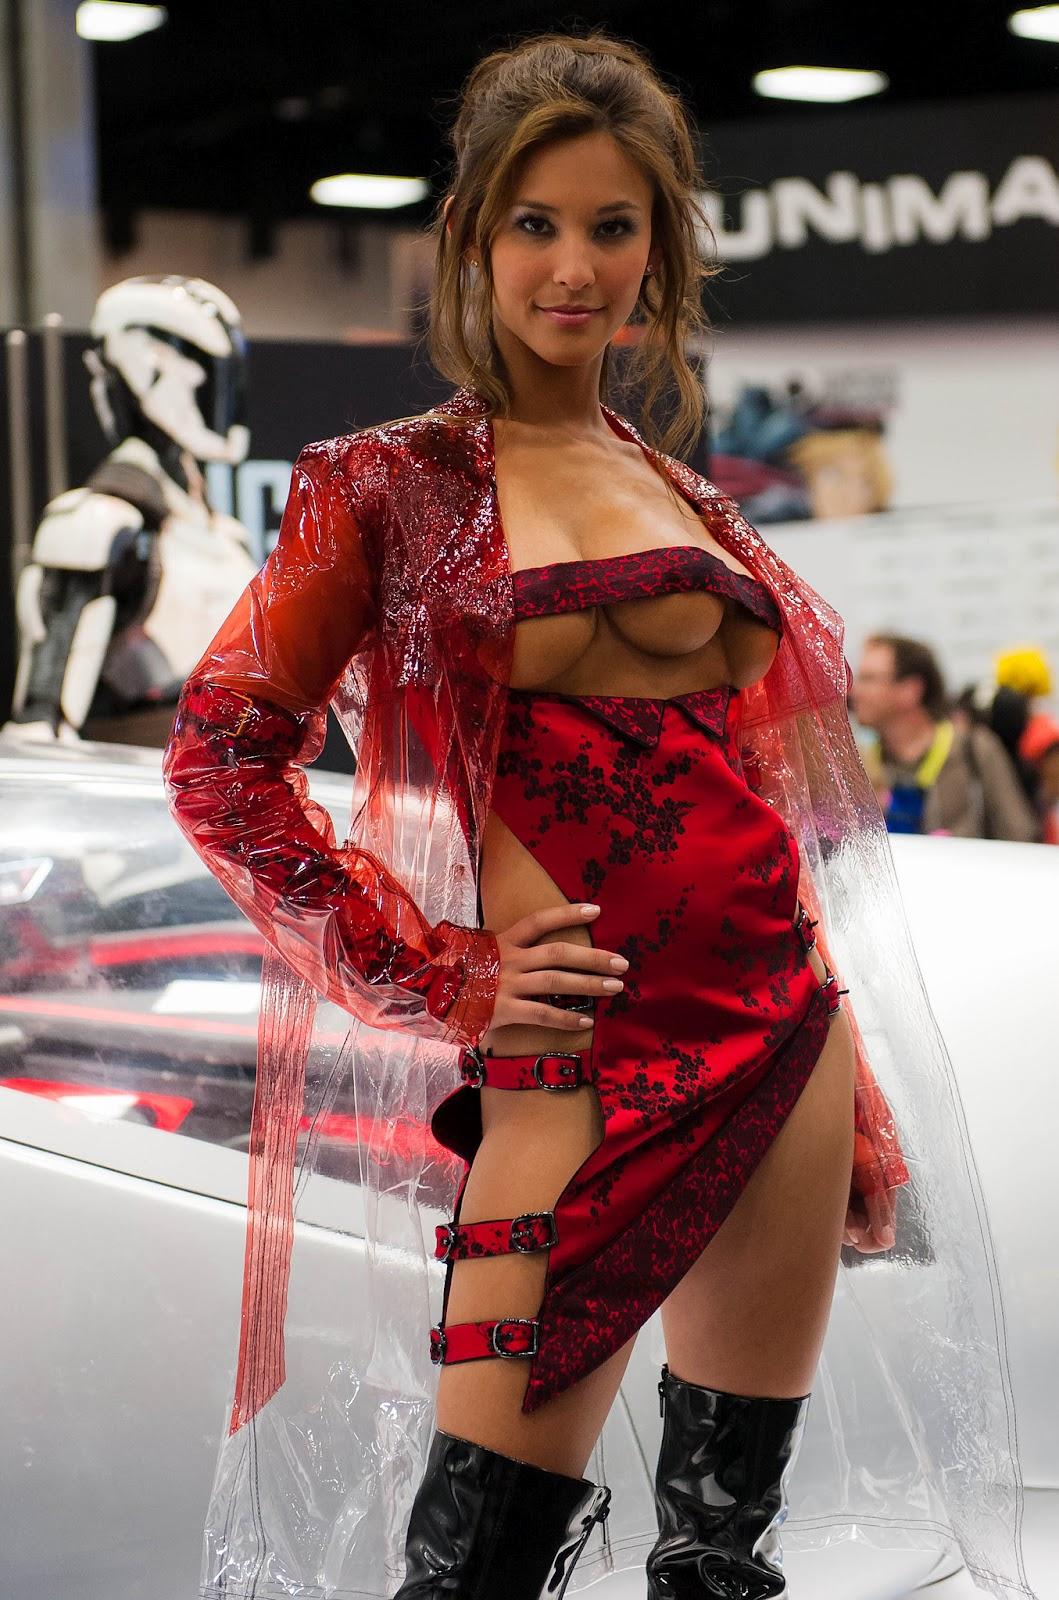 Kaitlyn Sexy Pics